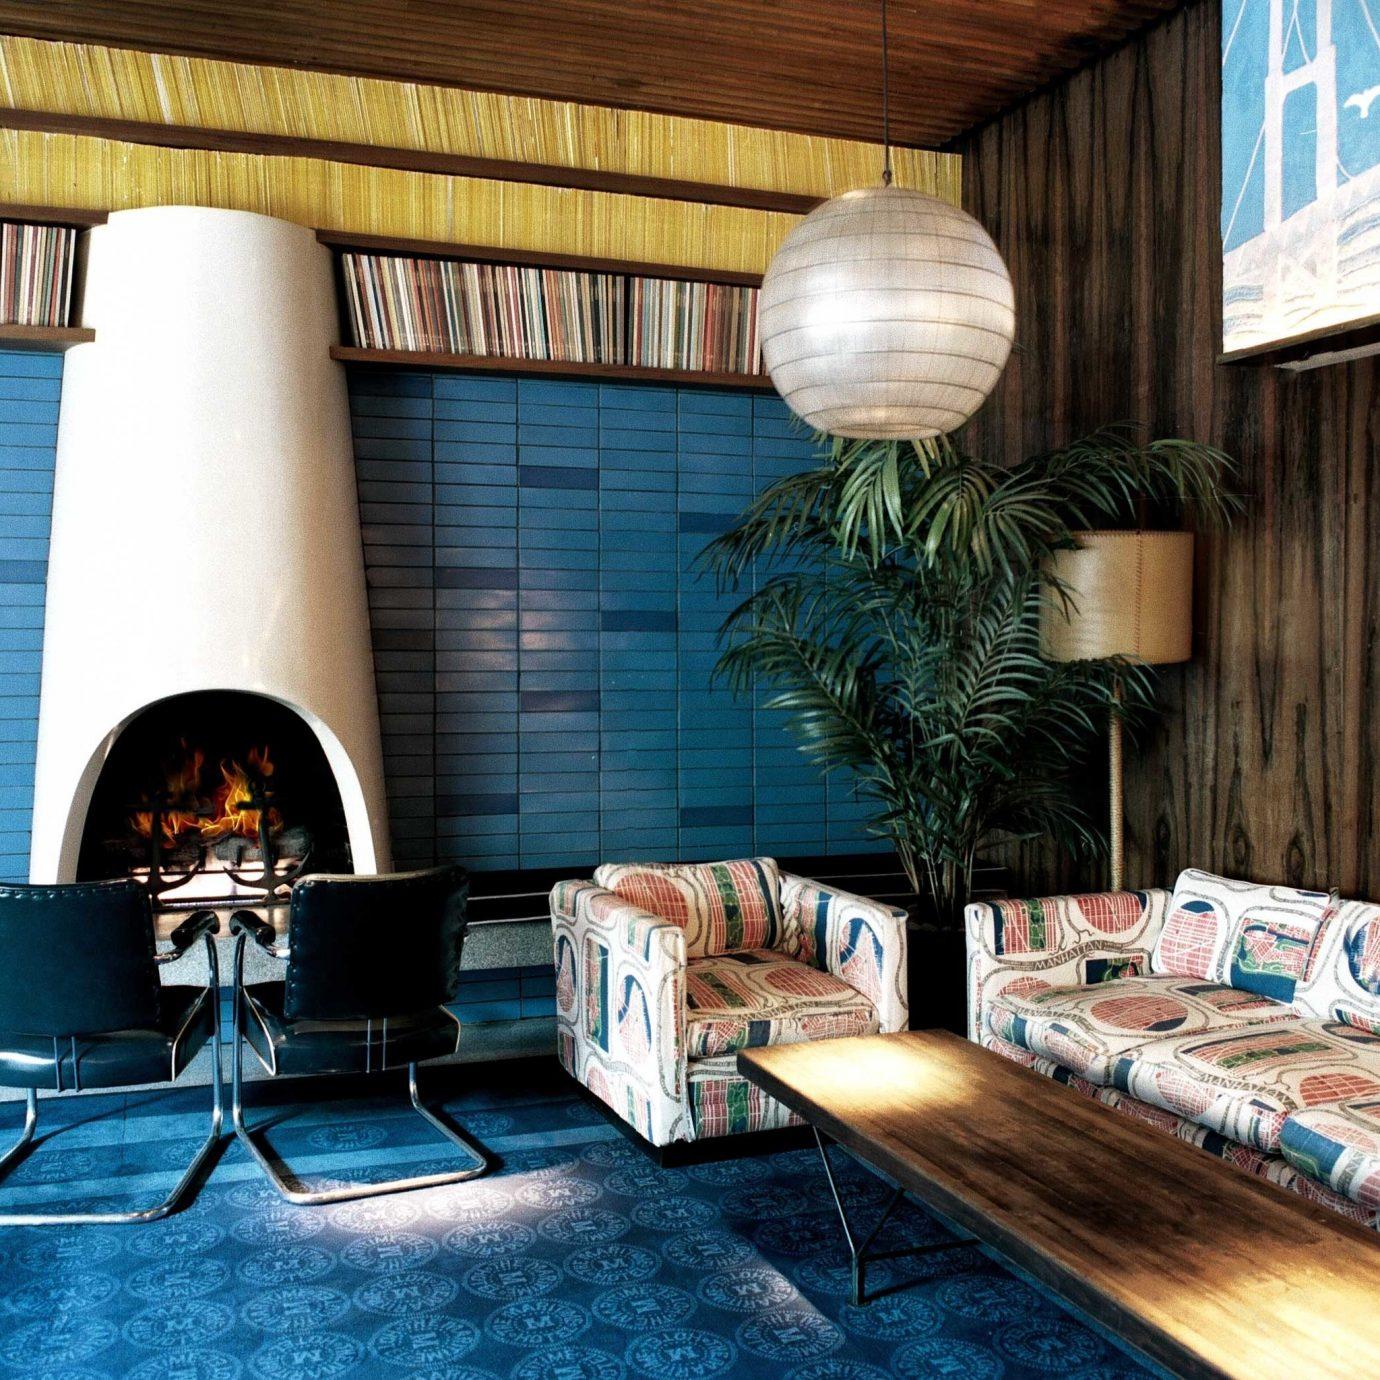 City Fireplace Lounge Resort house home restaurant living room cottage